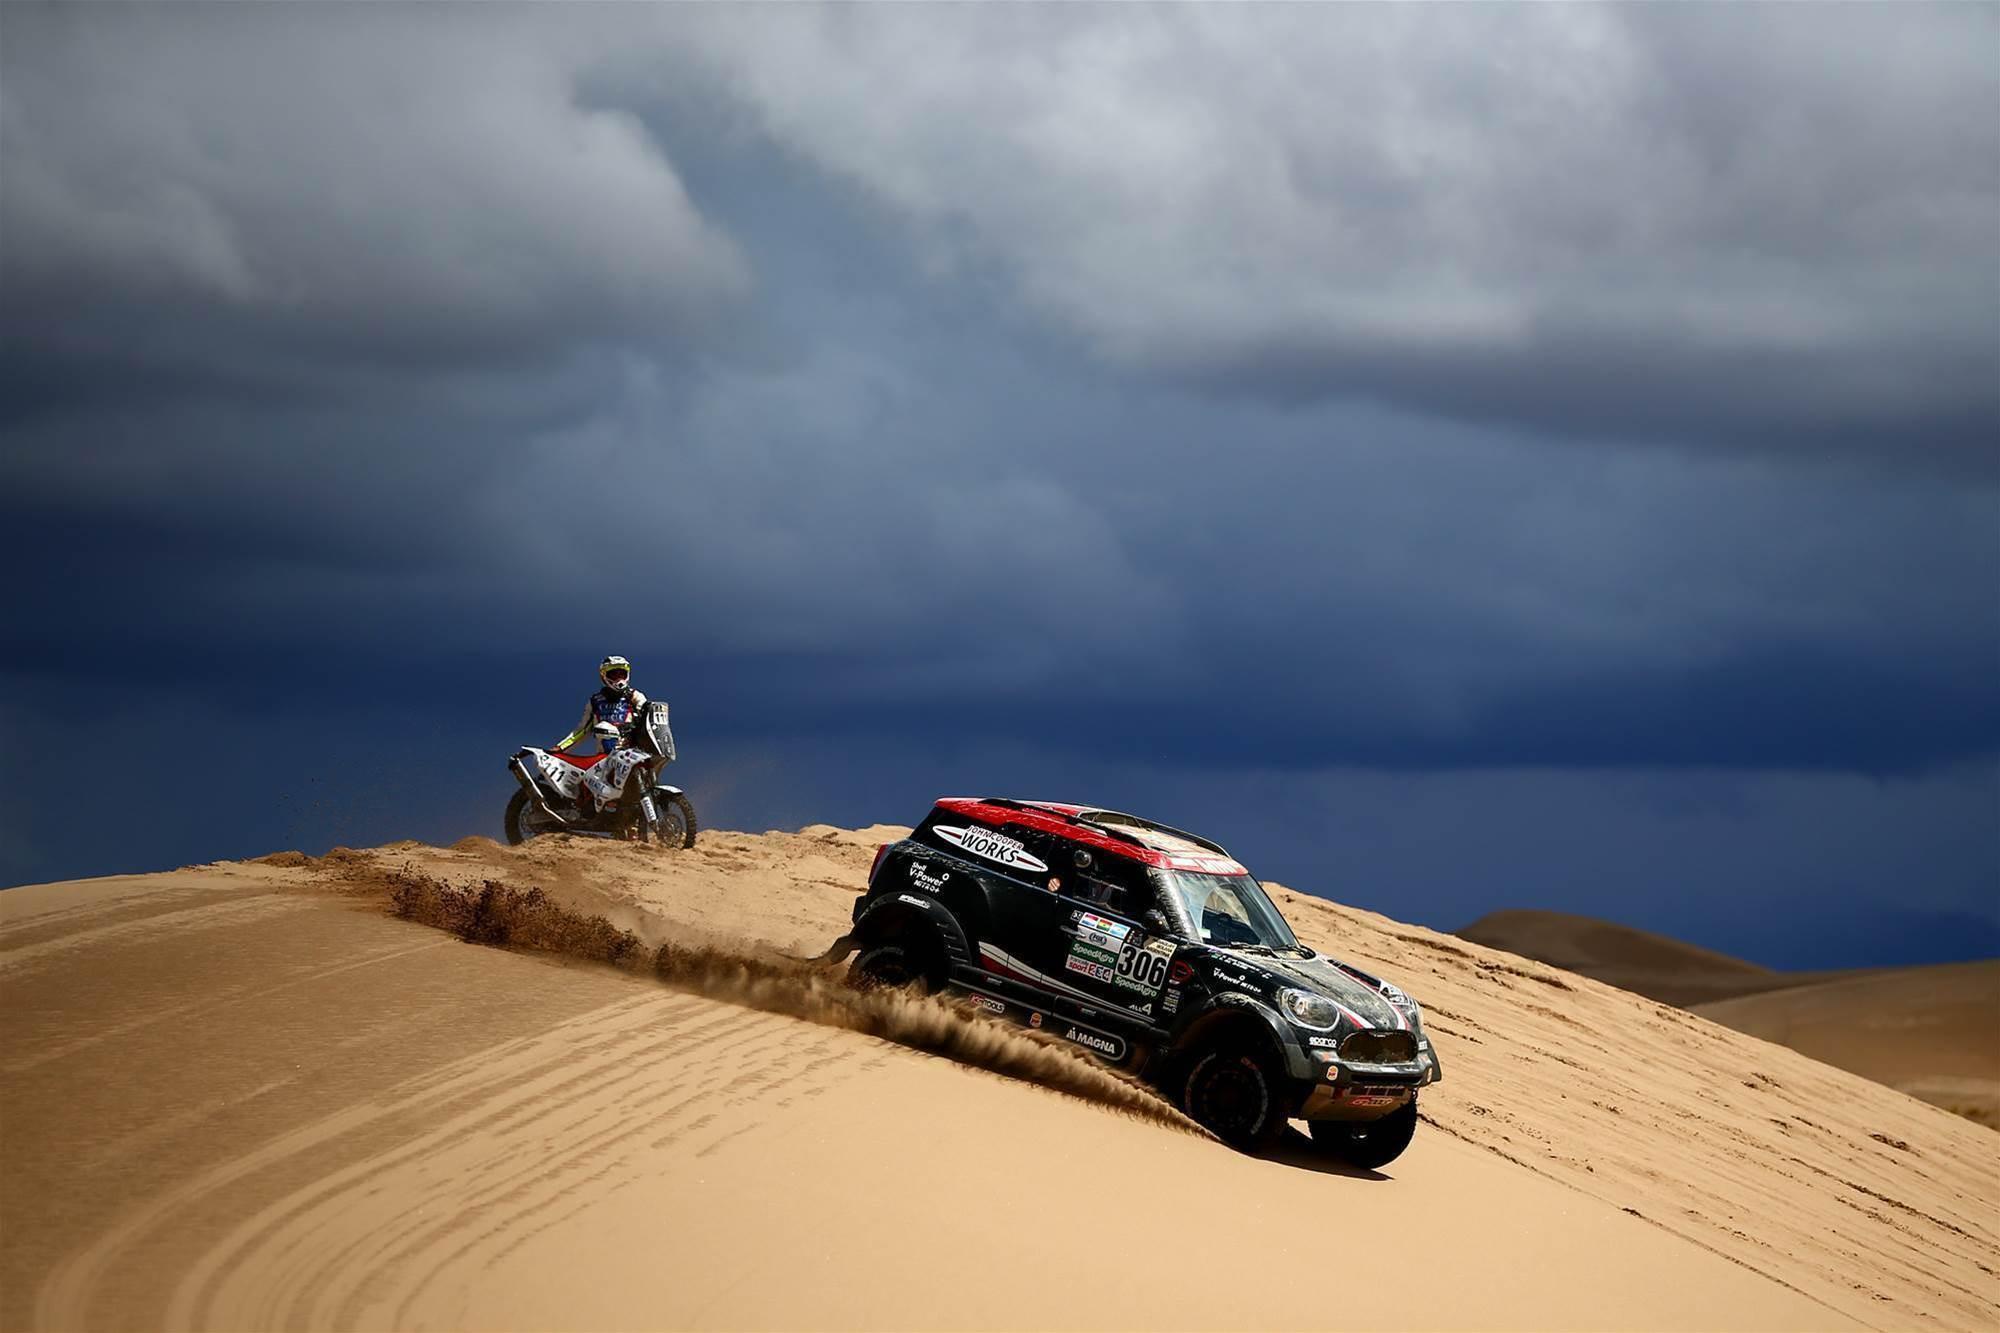 Pics: Dakar Rally 2017